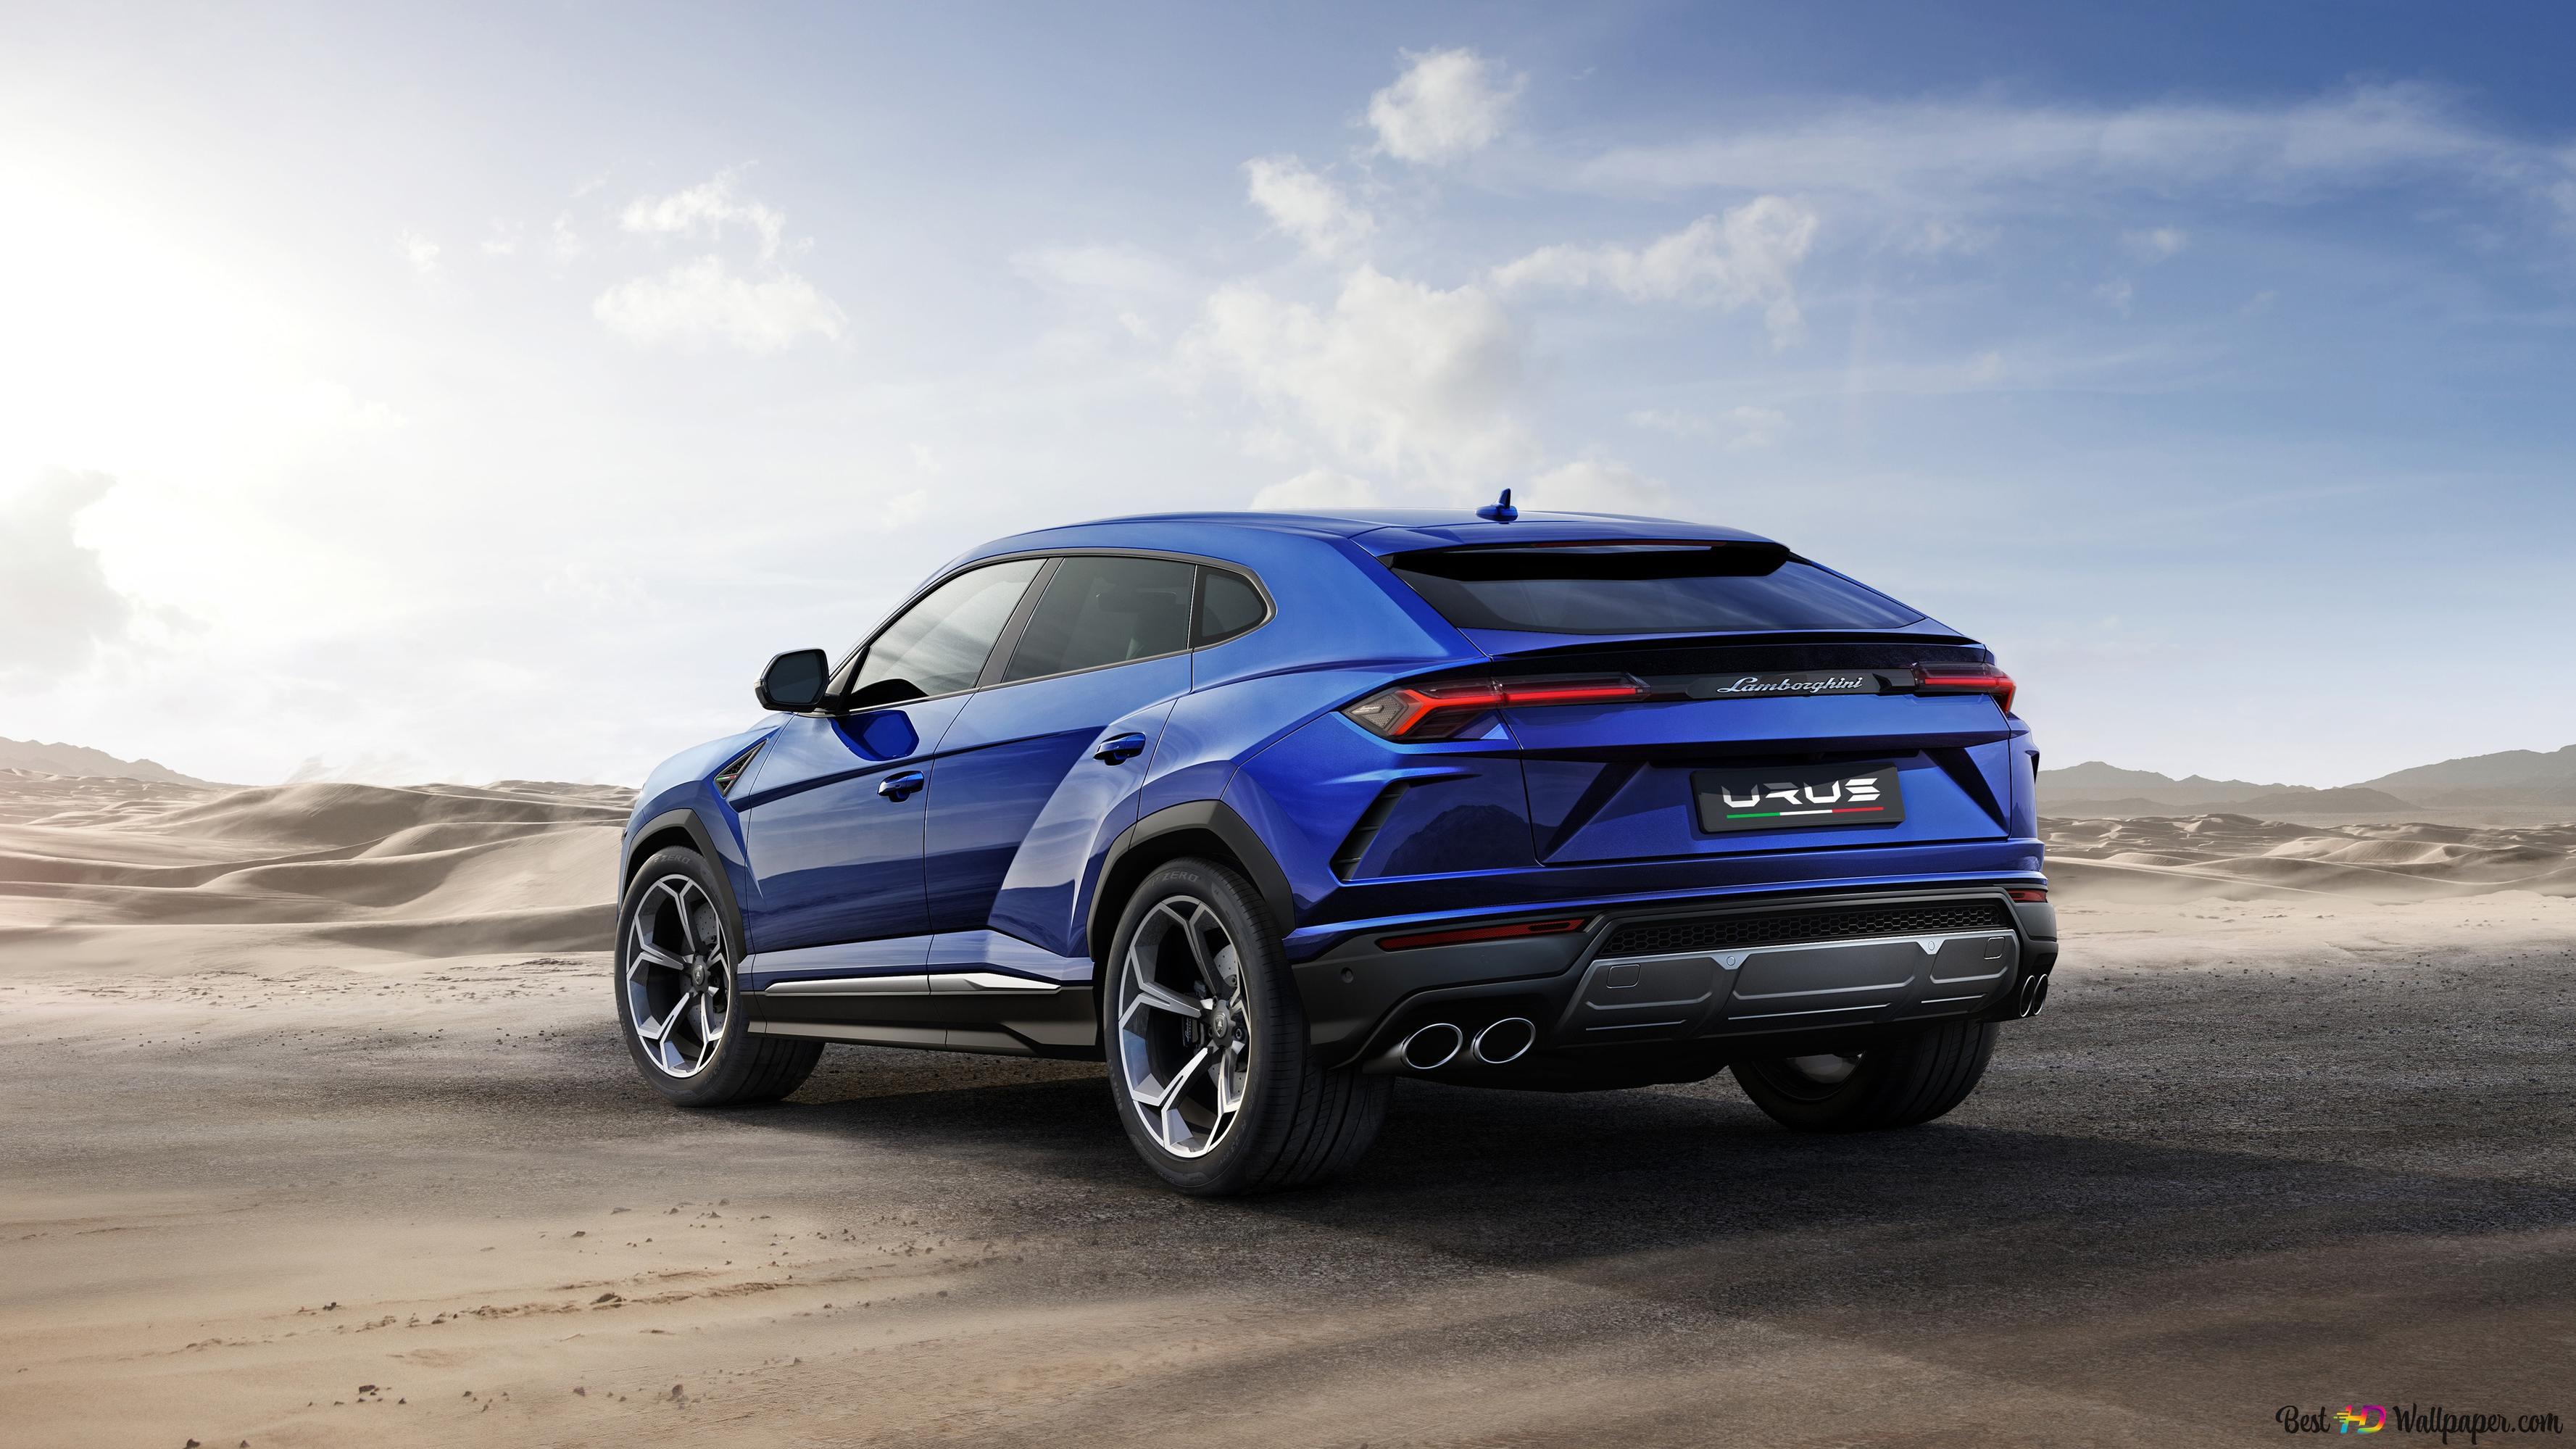 Blue Lamborghini Urus Hd Wallpaper Download